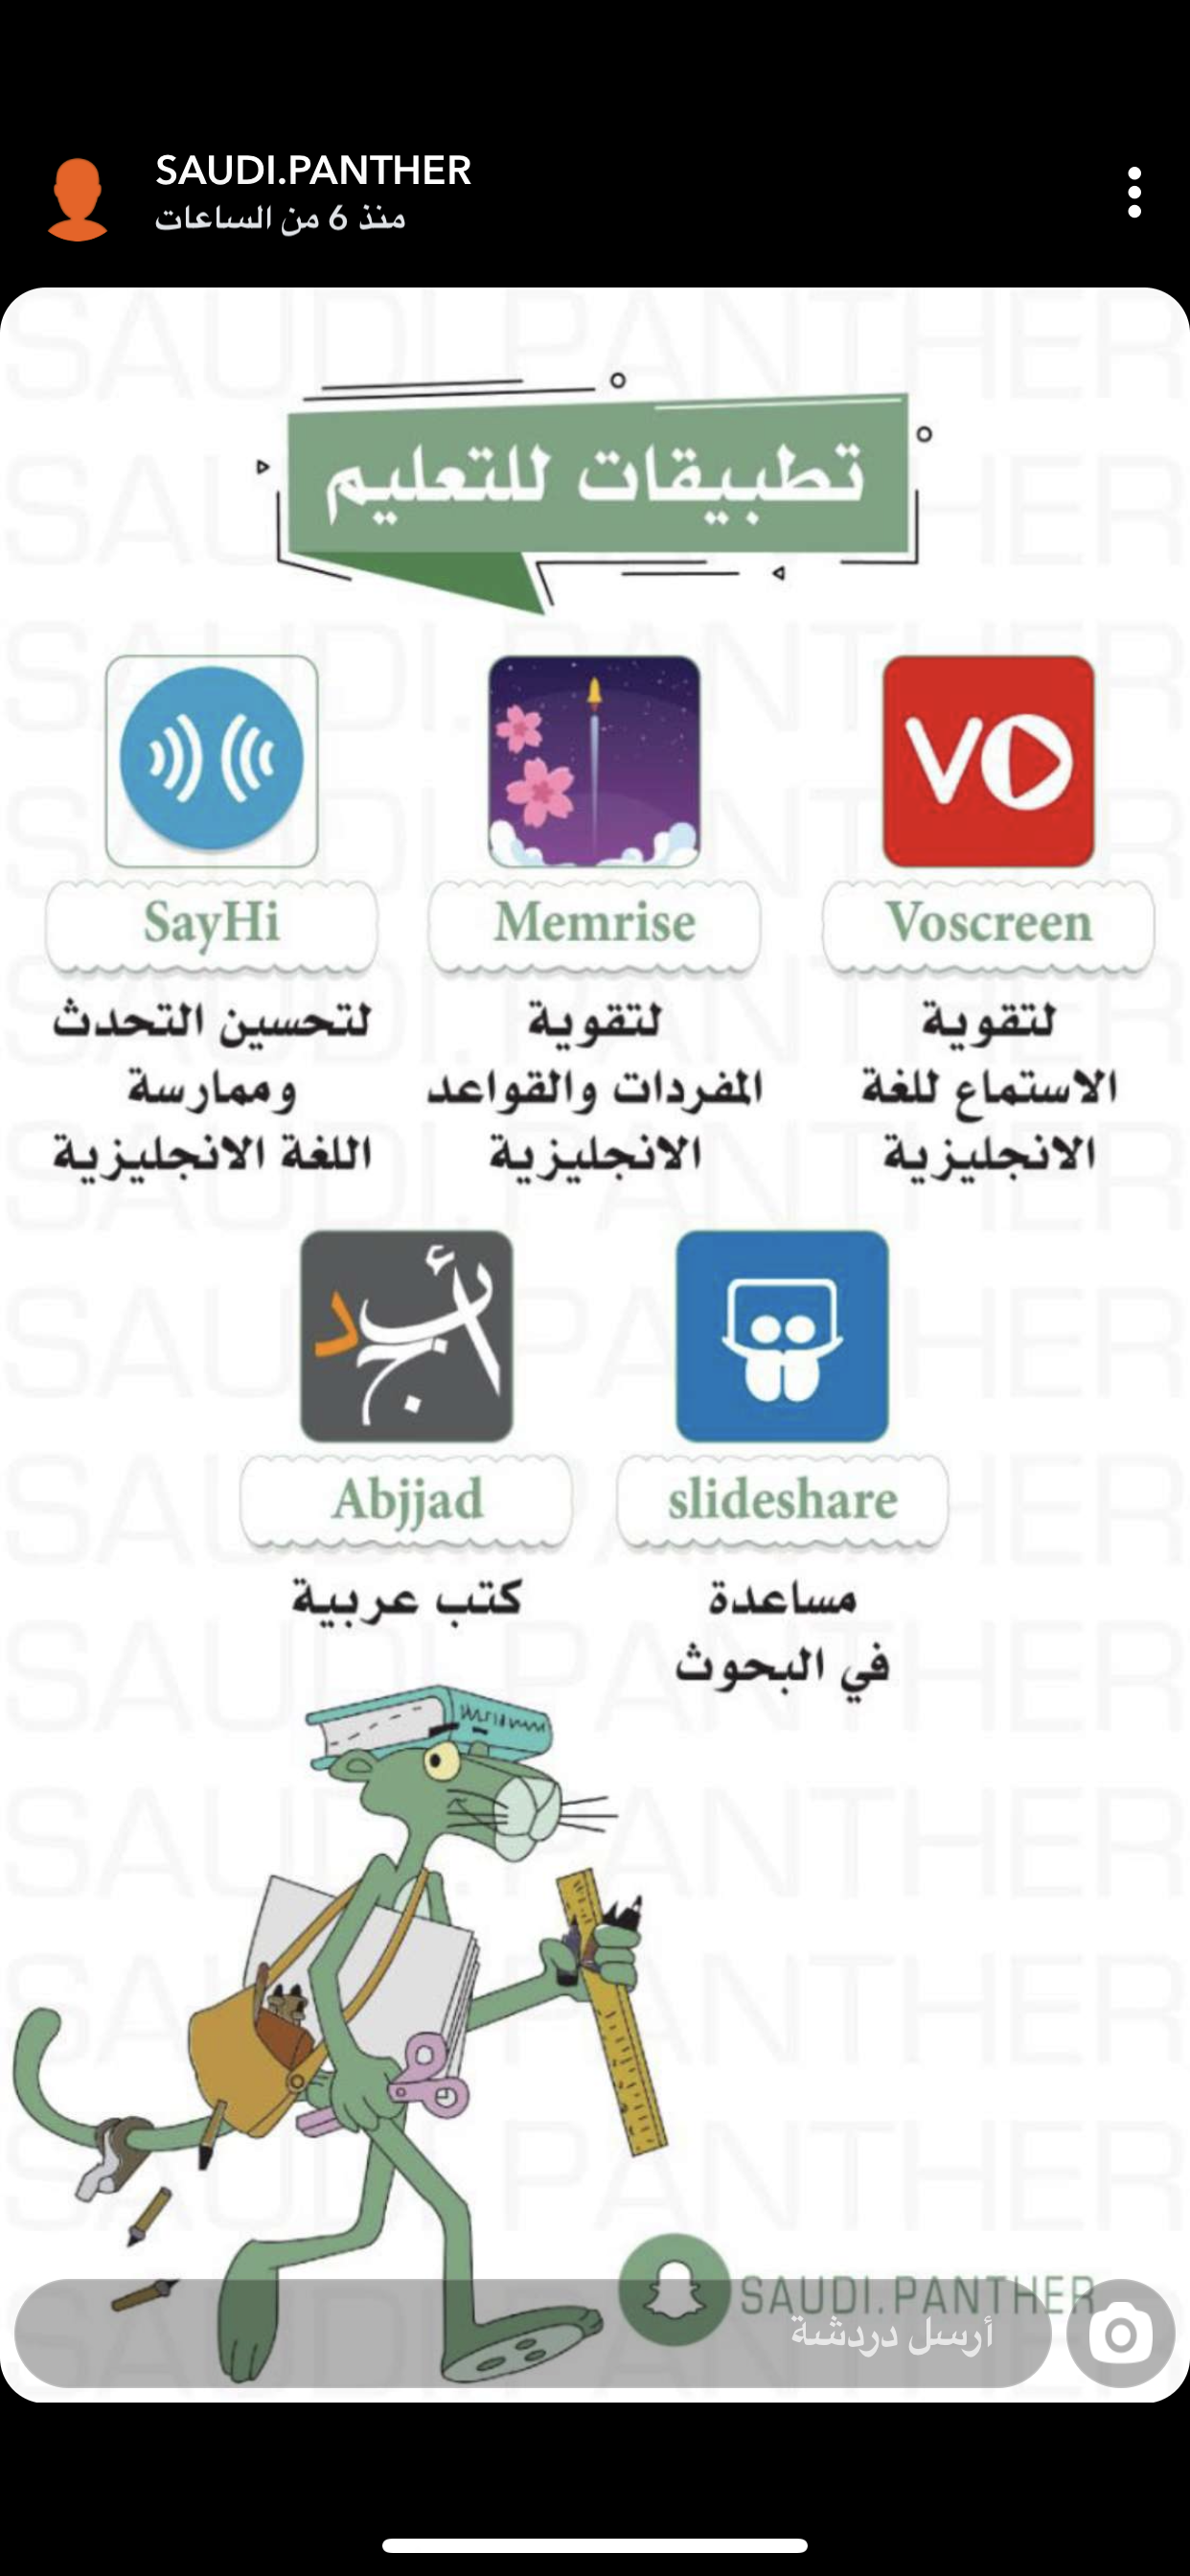 Pin By Demoįselle Milla On Arabic Food In 2020 English Language Learning Grammar English Writing Skills Learning Websites